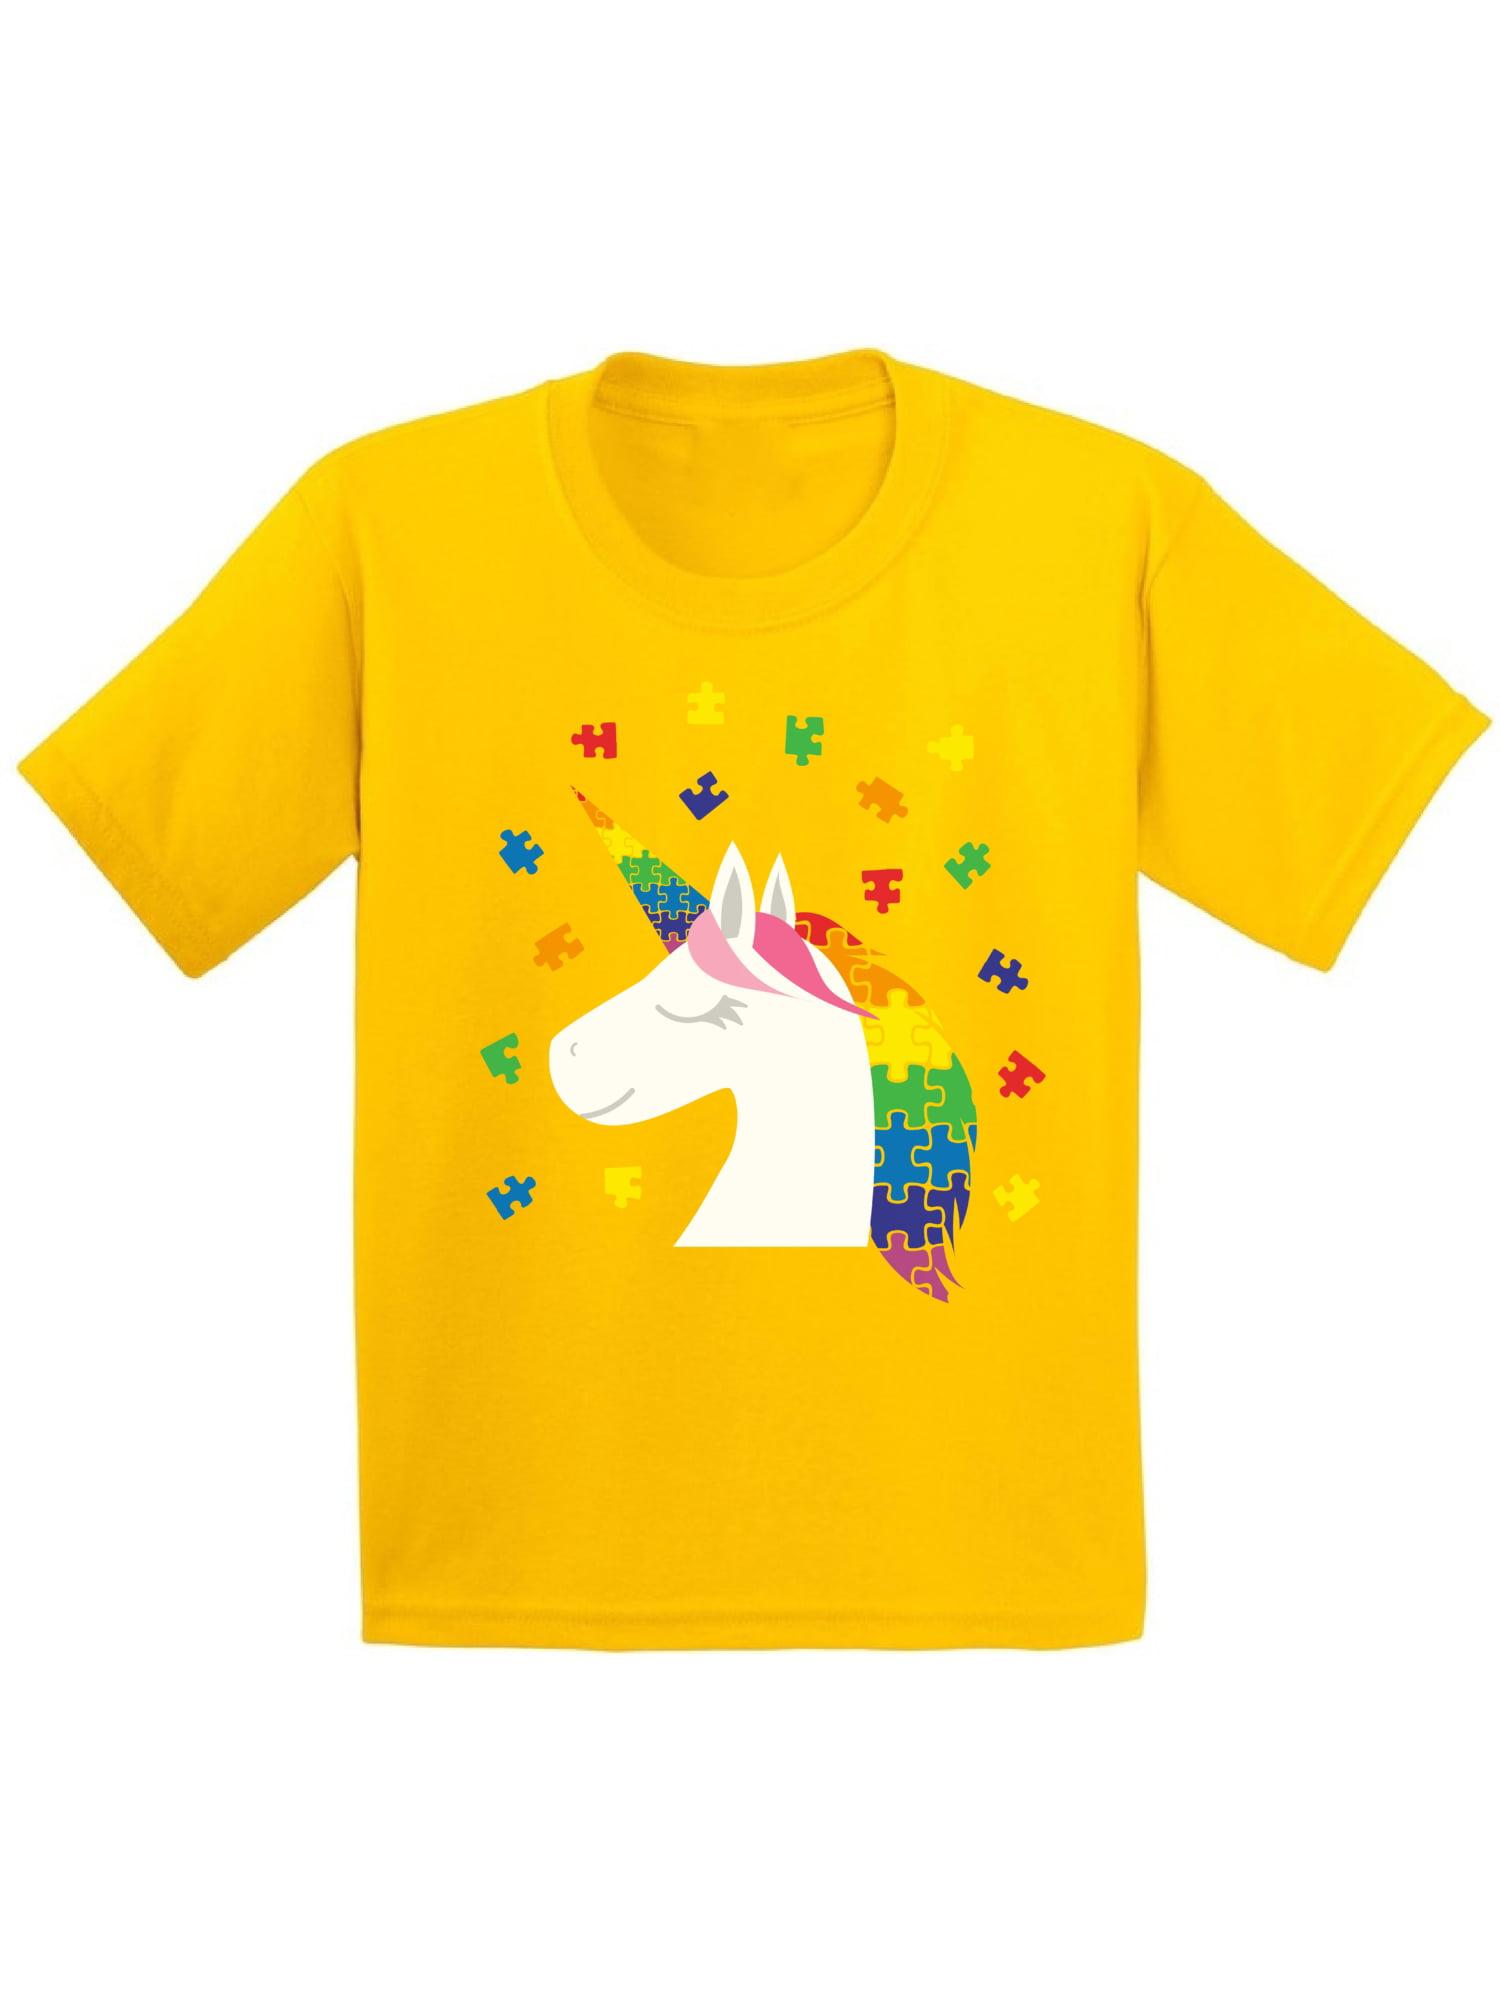 Awkward Styles Youth Unicorn Autism Shirt for Kids Autism Awareness Shirt Puzzle Autism Gifts for Kids Autistic Kids Gift Ideas Autism Awareness Shirts Kids Autism Gifts Awareness Gifts